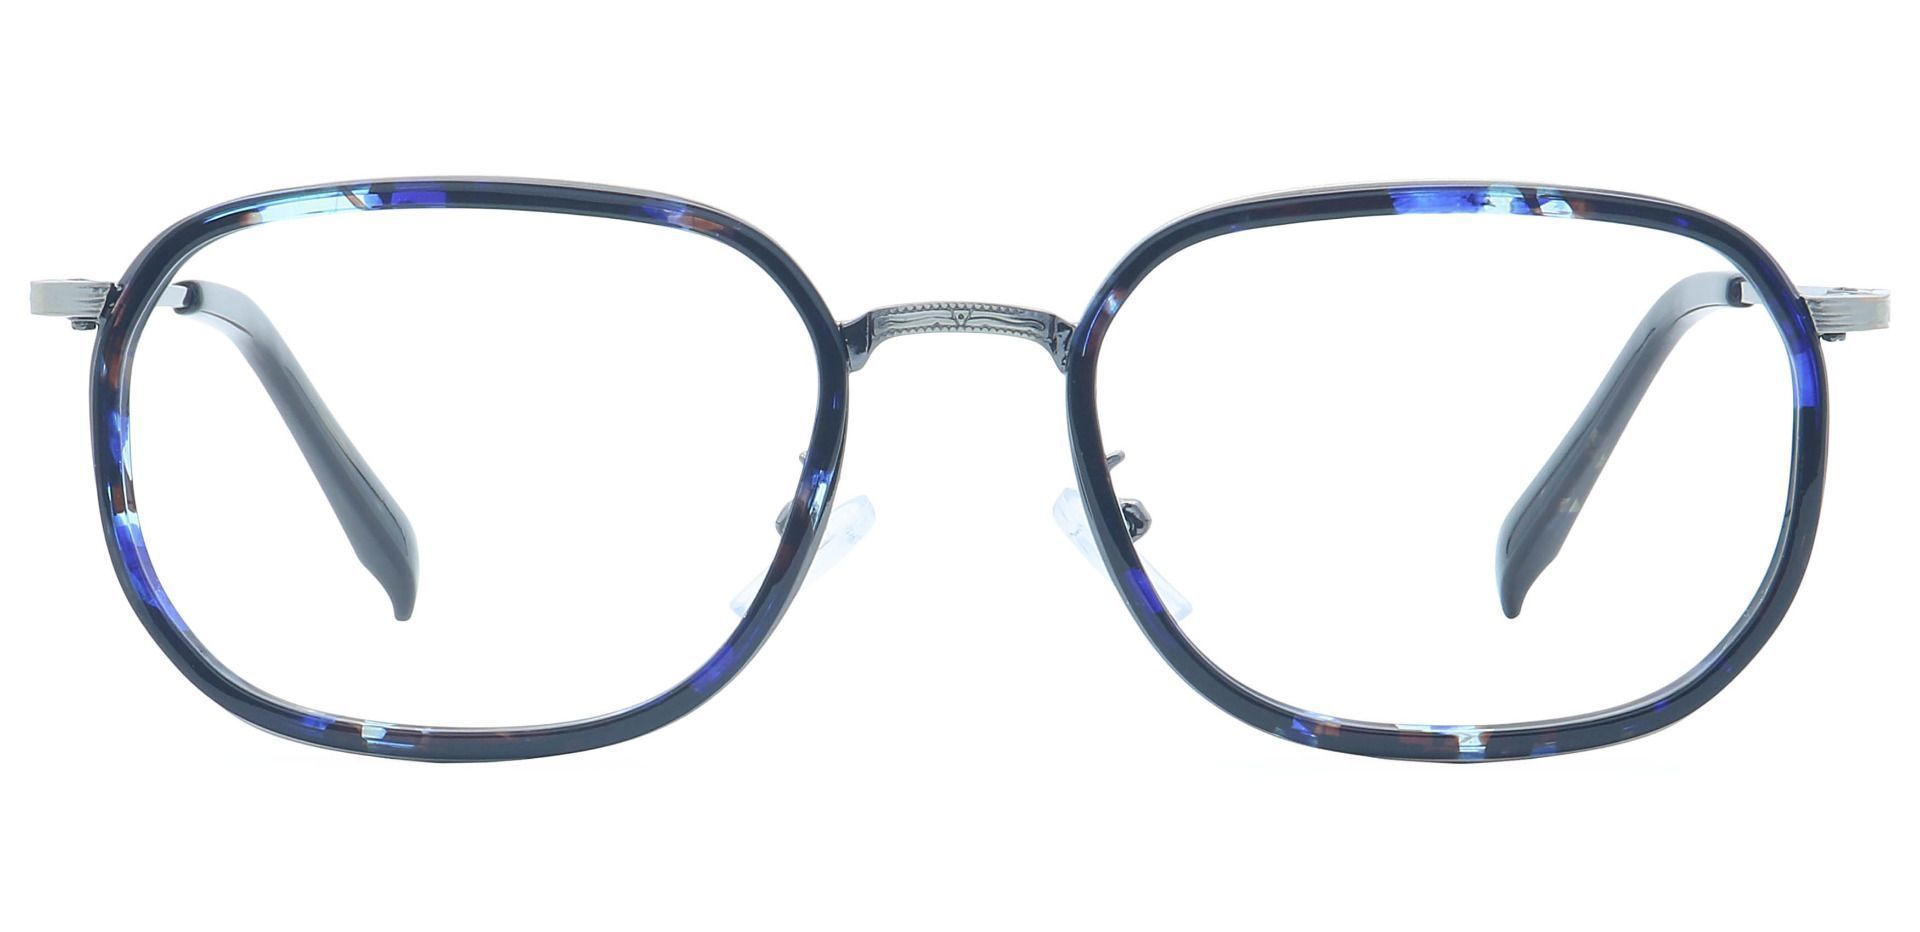 Harlem Oval Reading Glasses - Blue